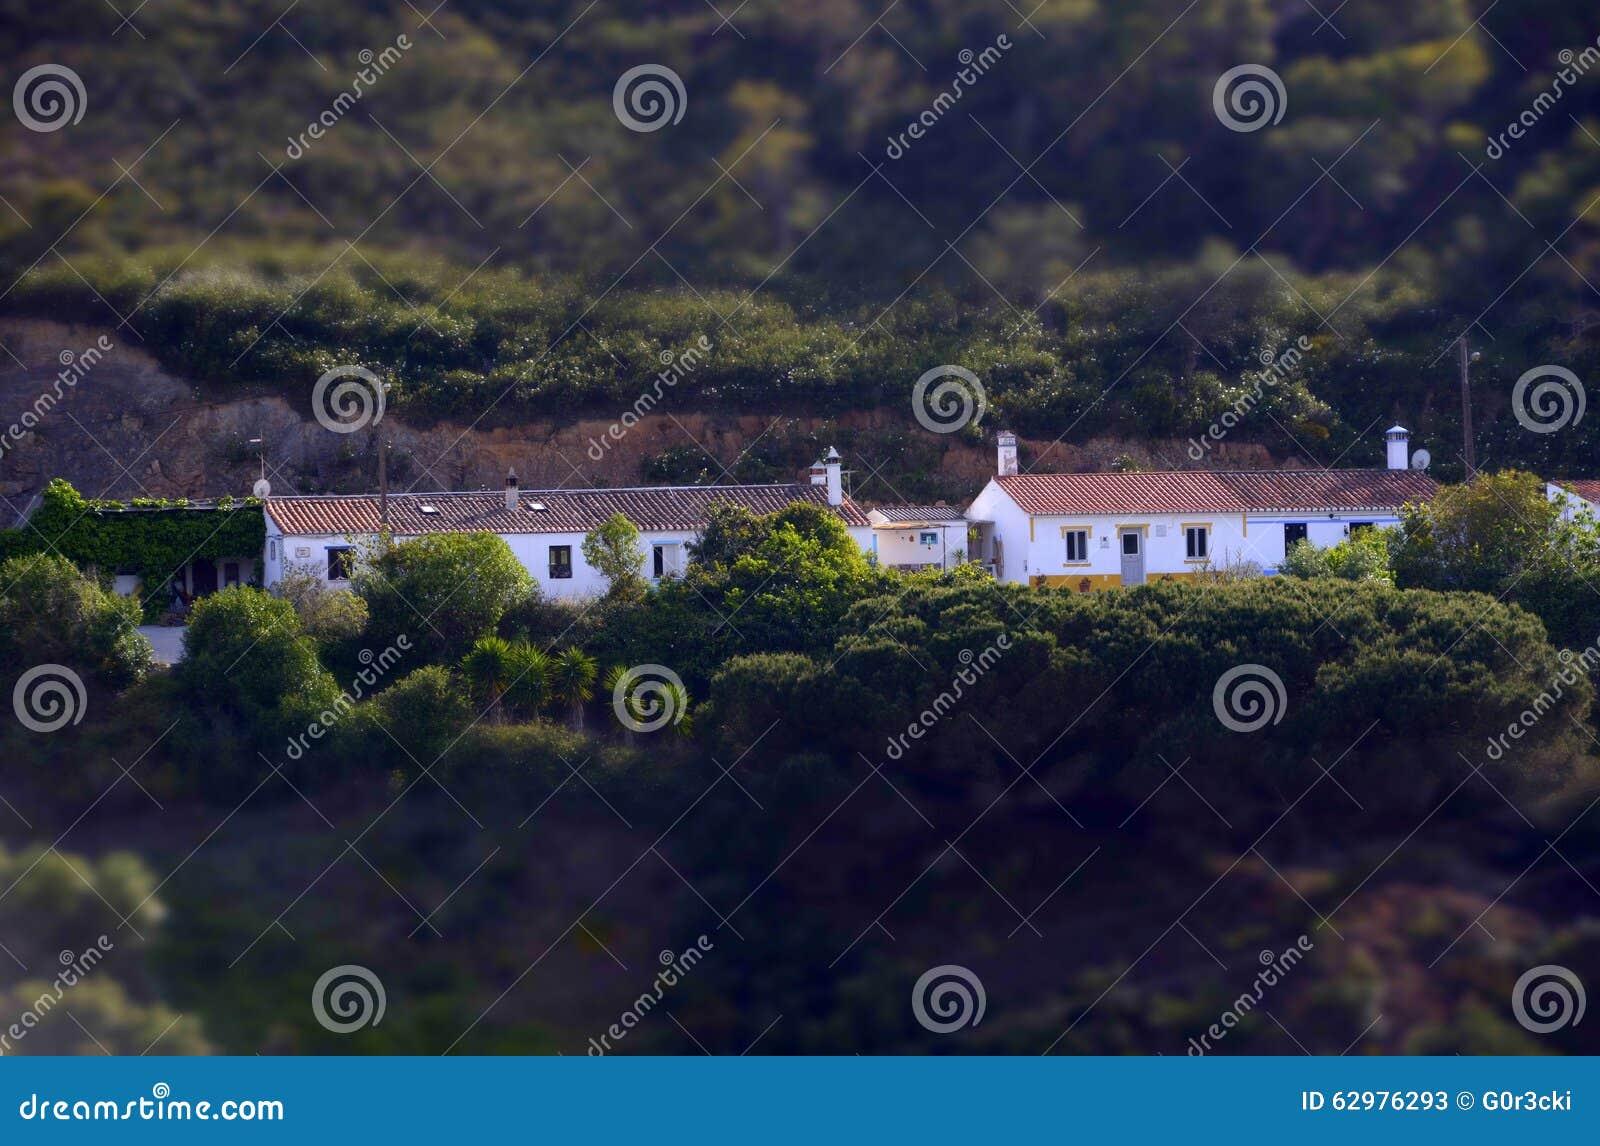 Miniatuureffect - Typische Mediterrane Huizen, Algarve Dorp